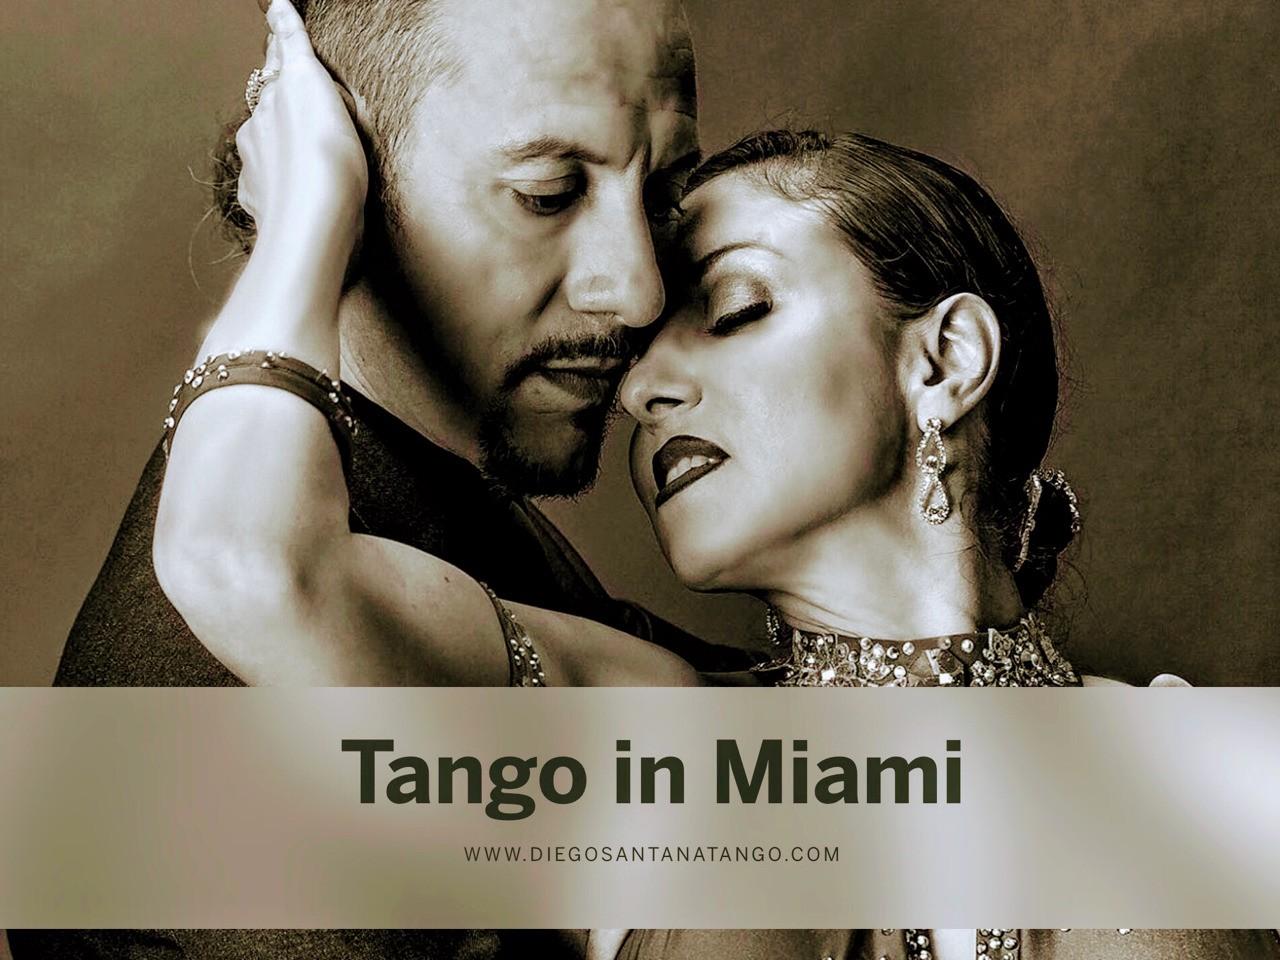 Tango in Miami #tangoinmiami www.diegosantanatango.com